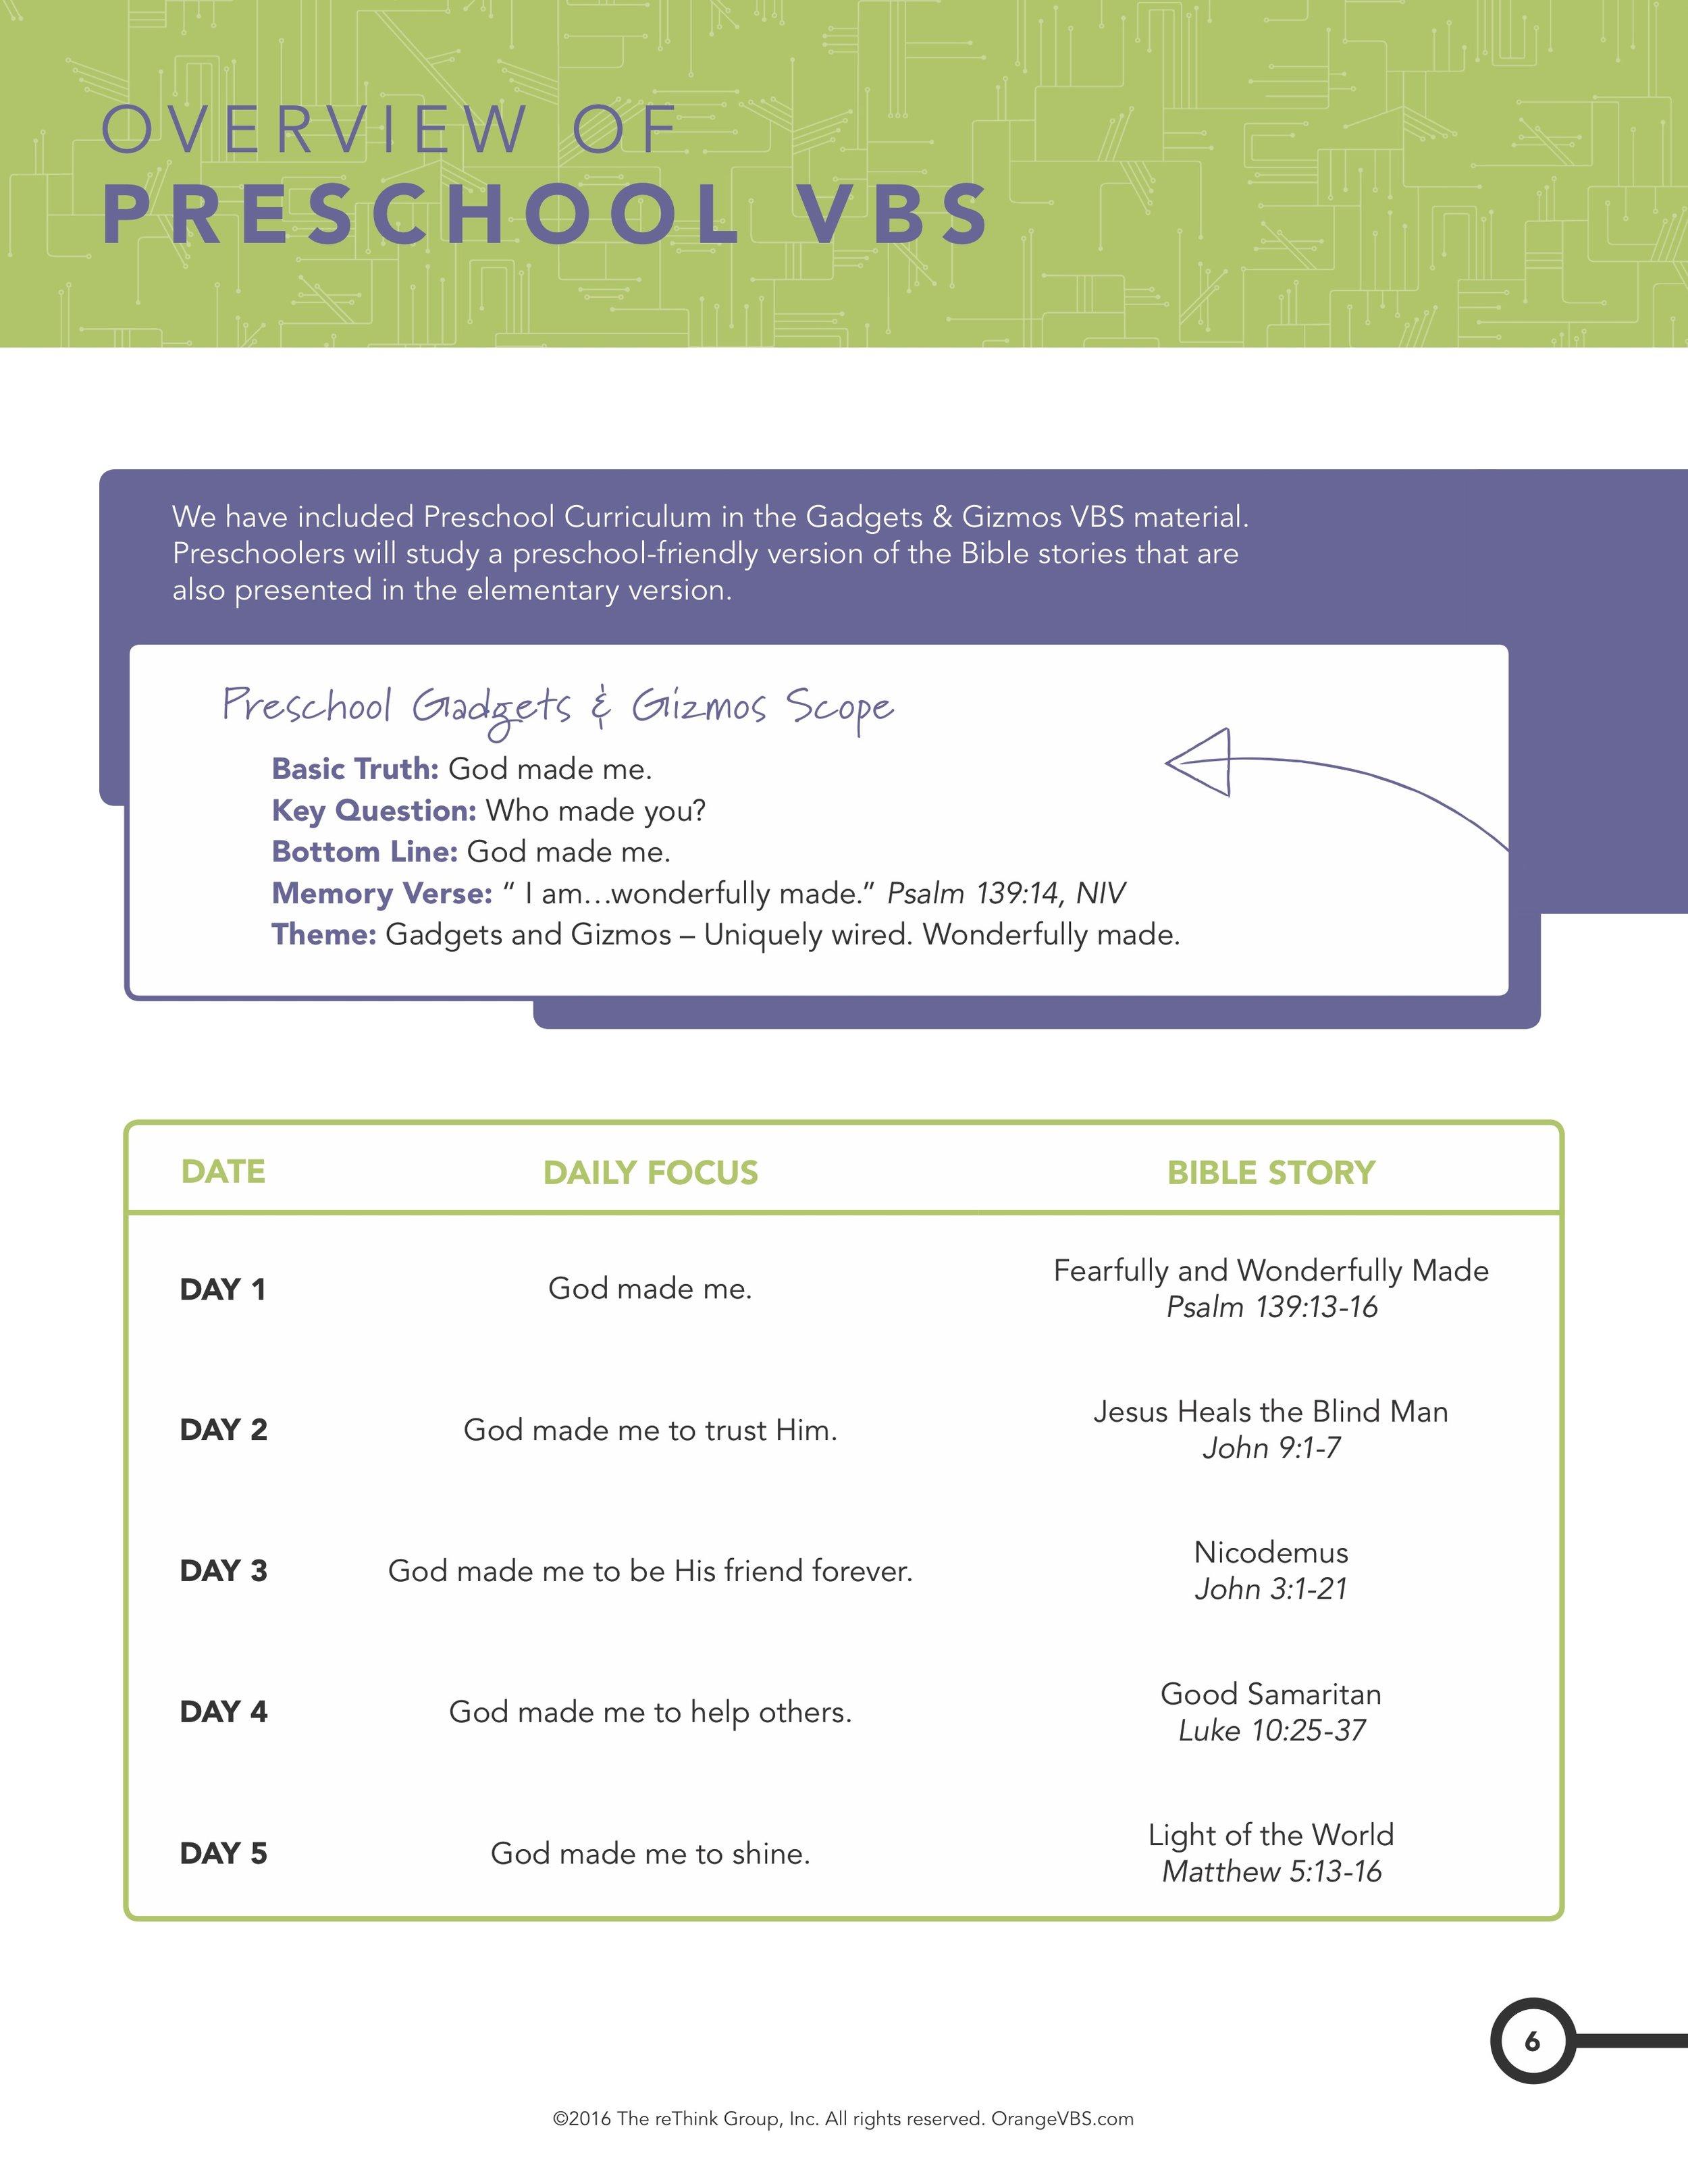 Preschool VBS Overview.